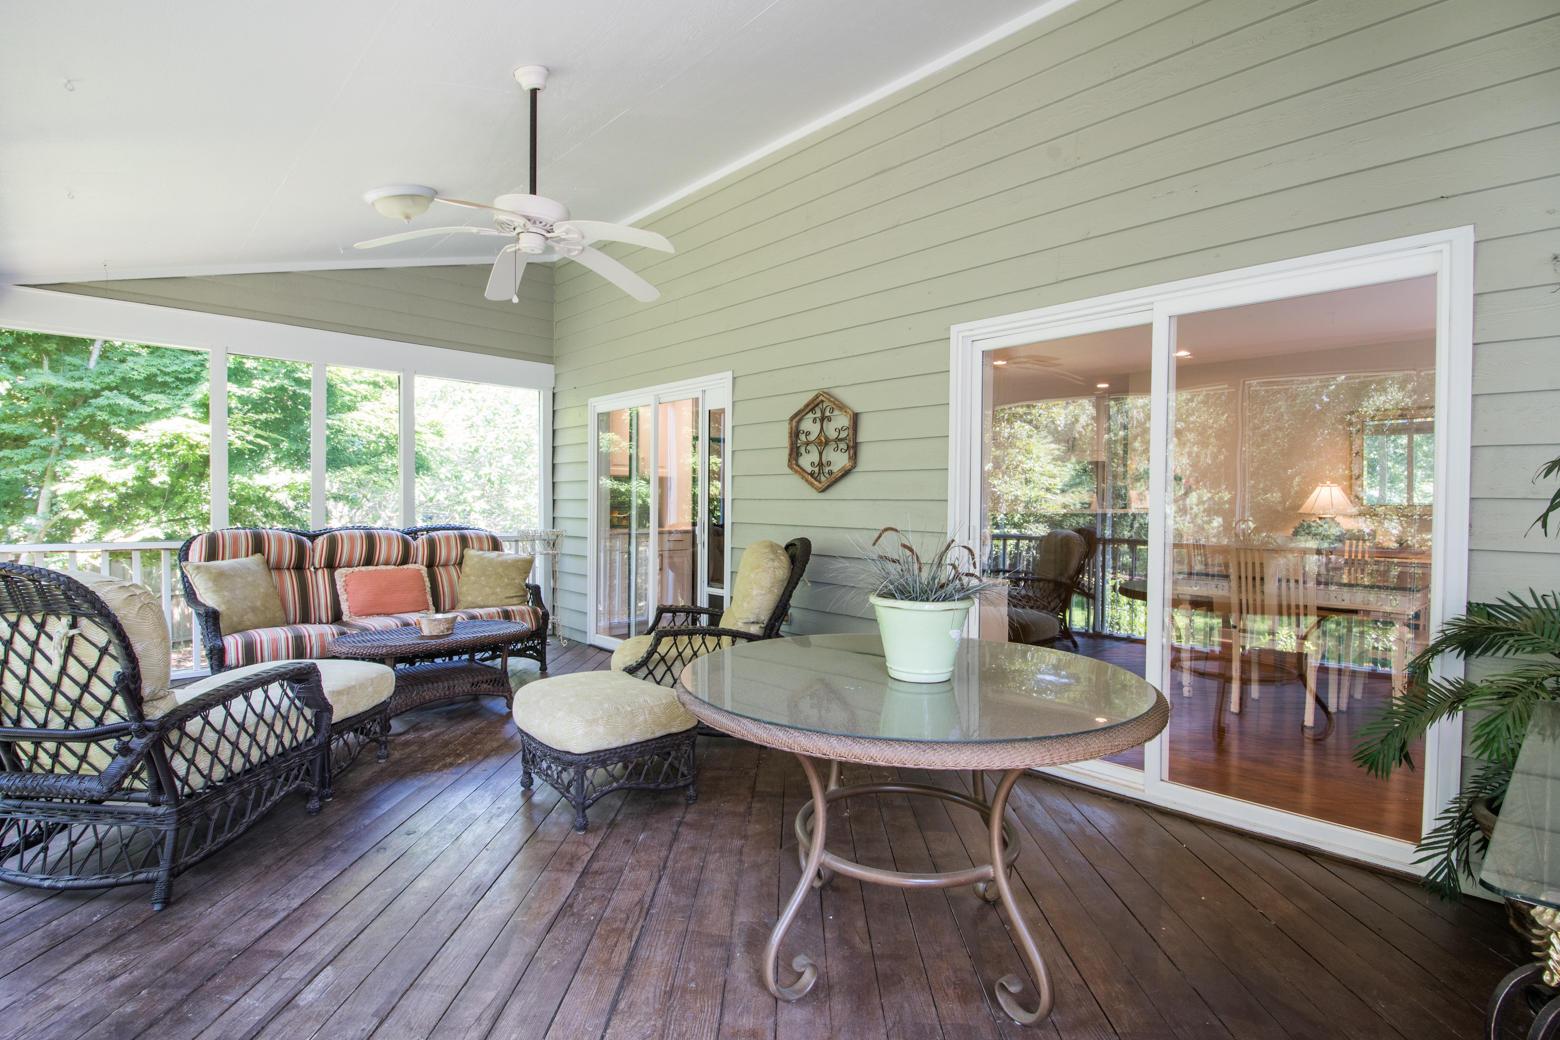 Wakendaw On The Creek Homes For Sale - 664 Oak Marsh, Mount Pleasant, SC - 31